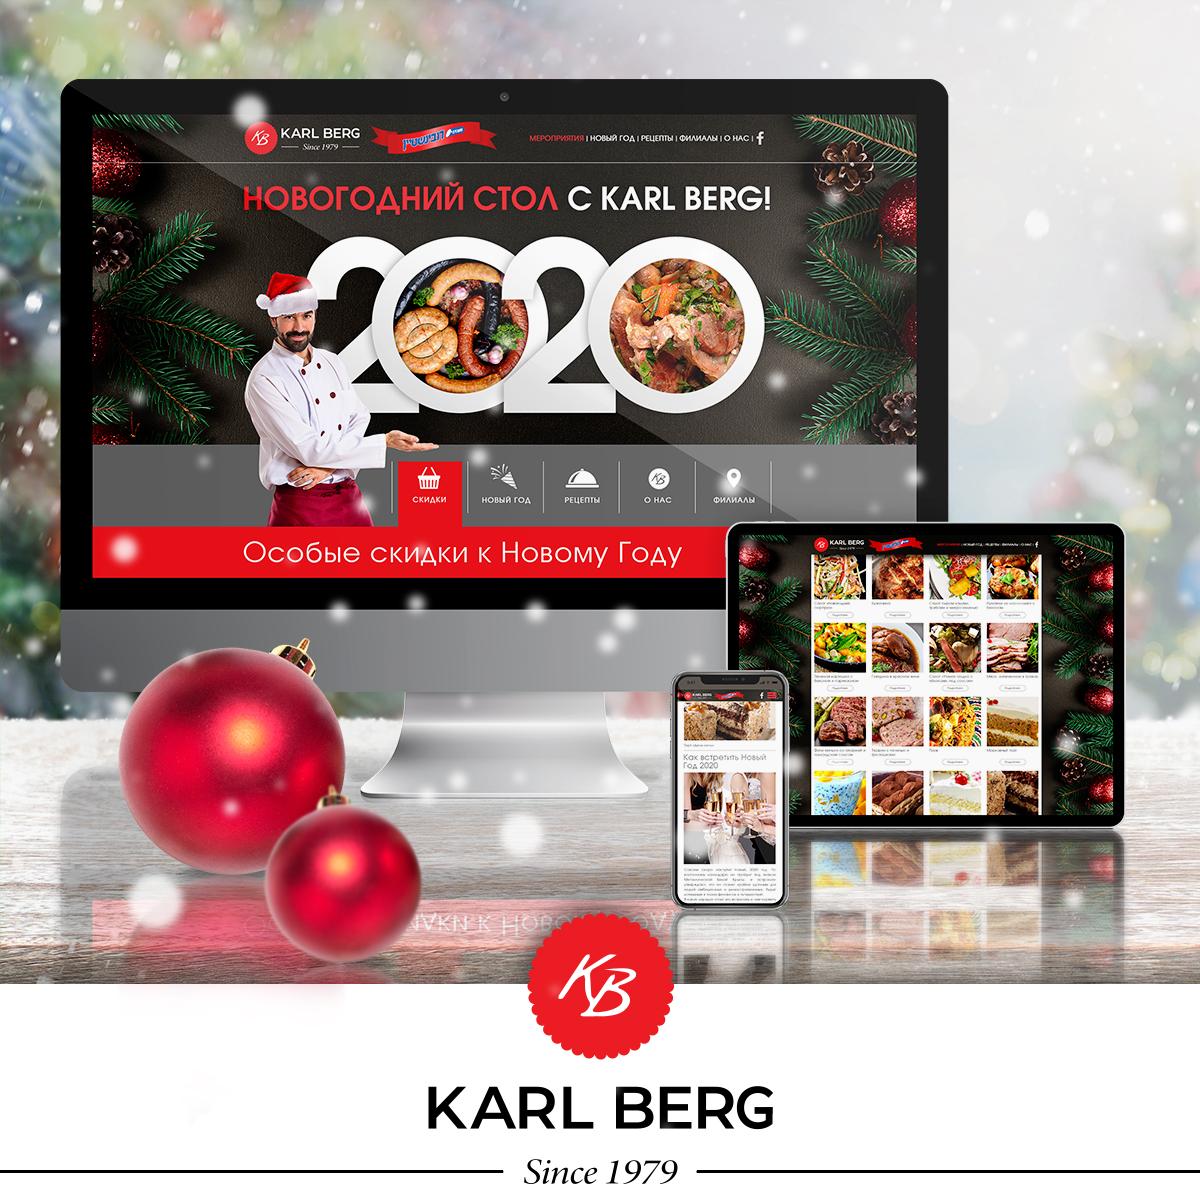 Karl Berg: все к новогоднему столу без лишних затрат!